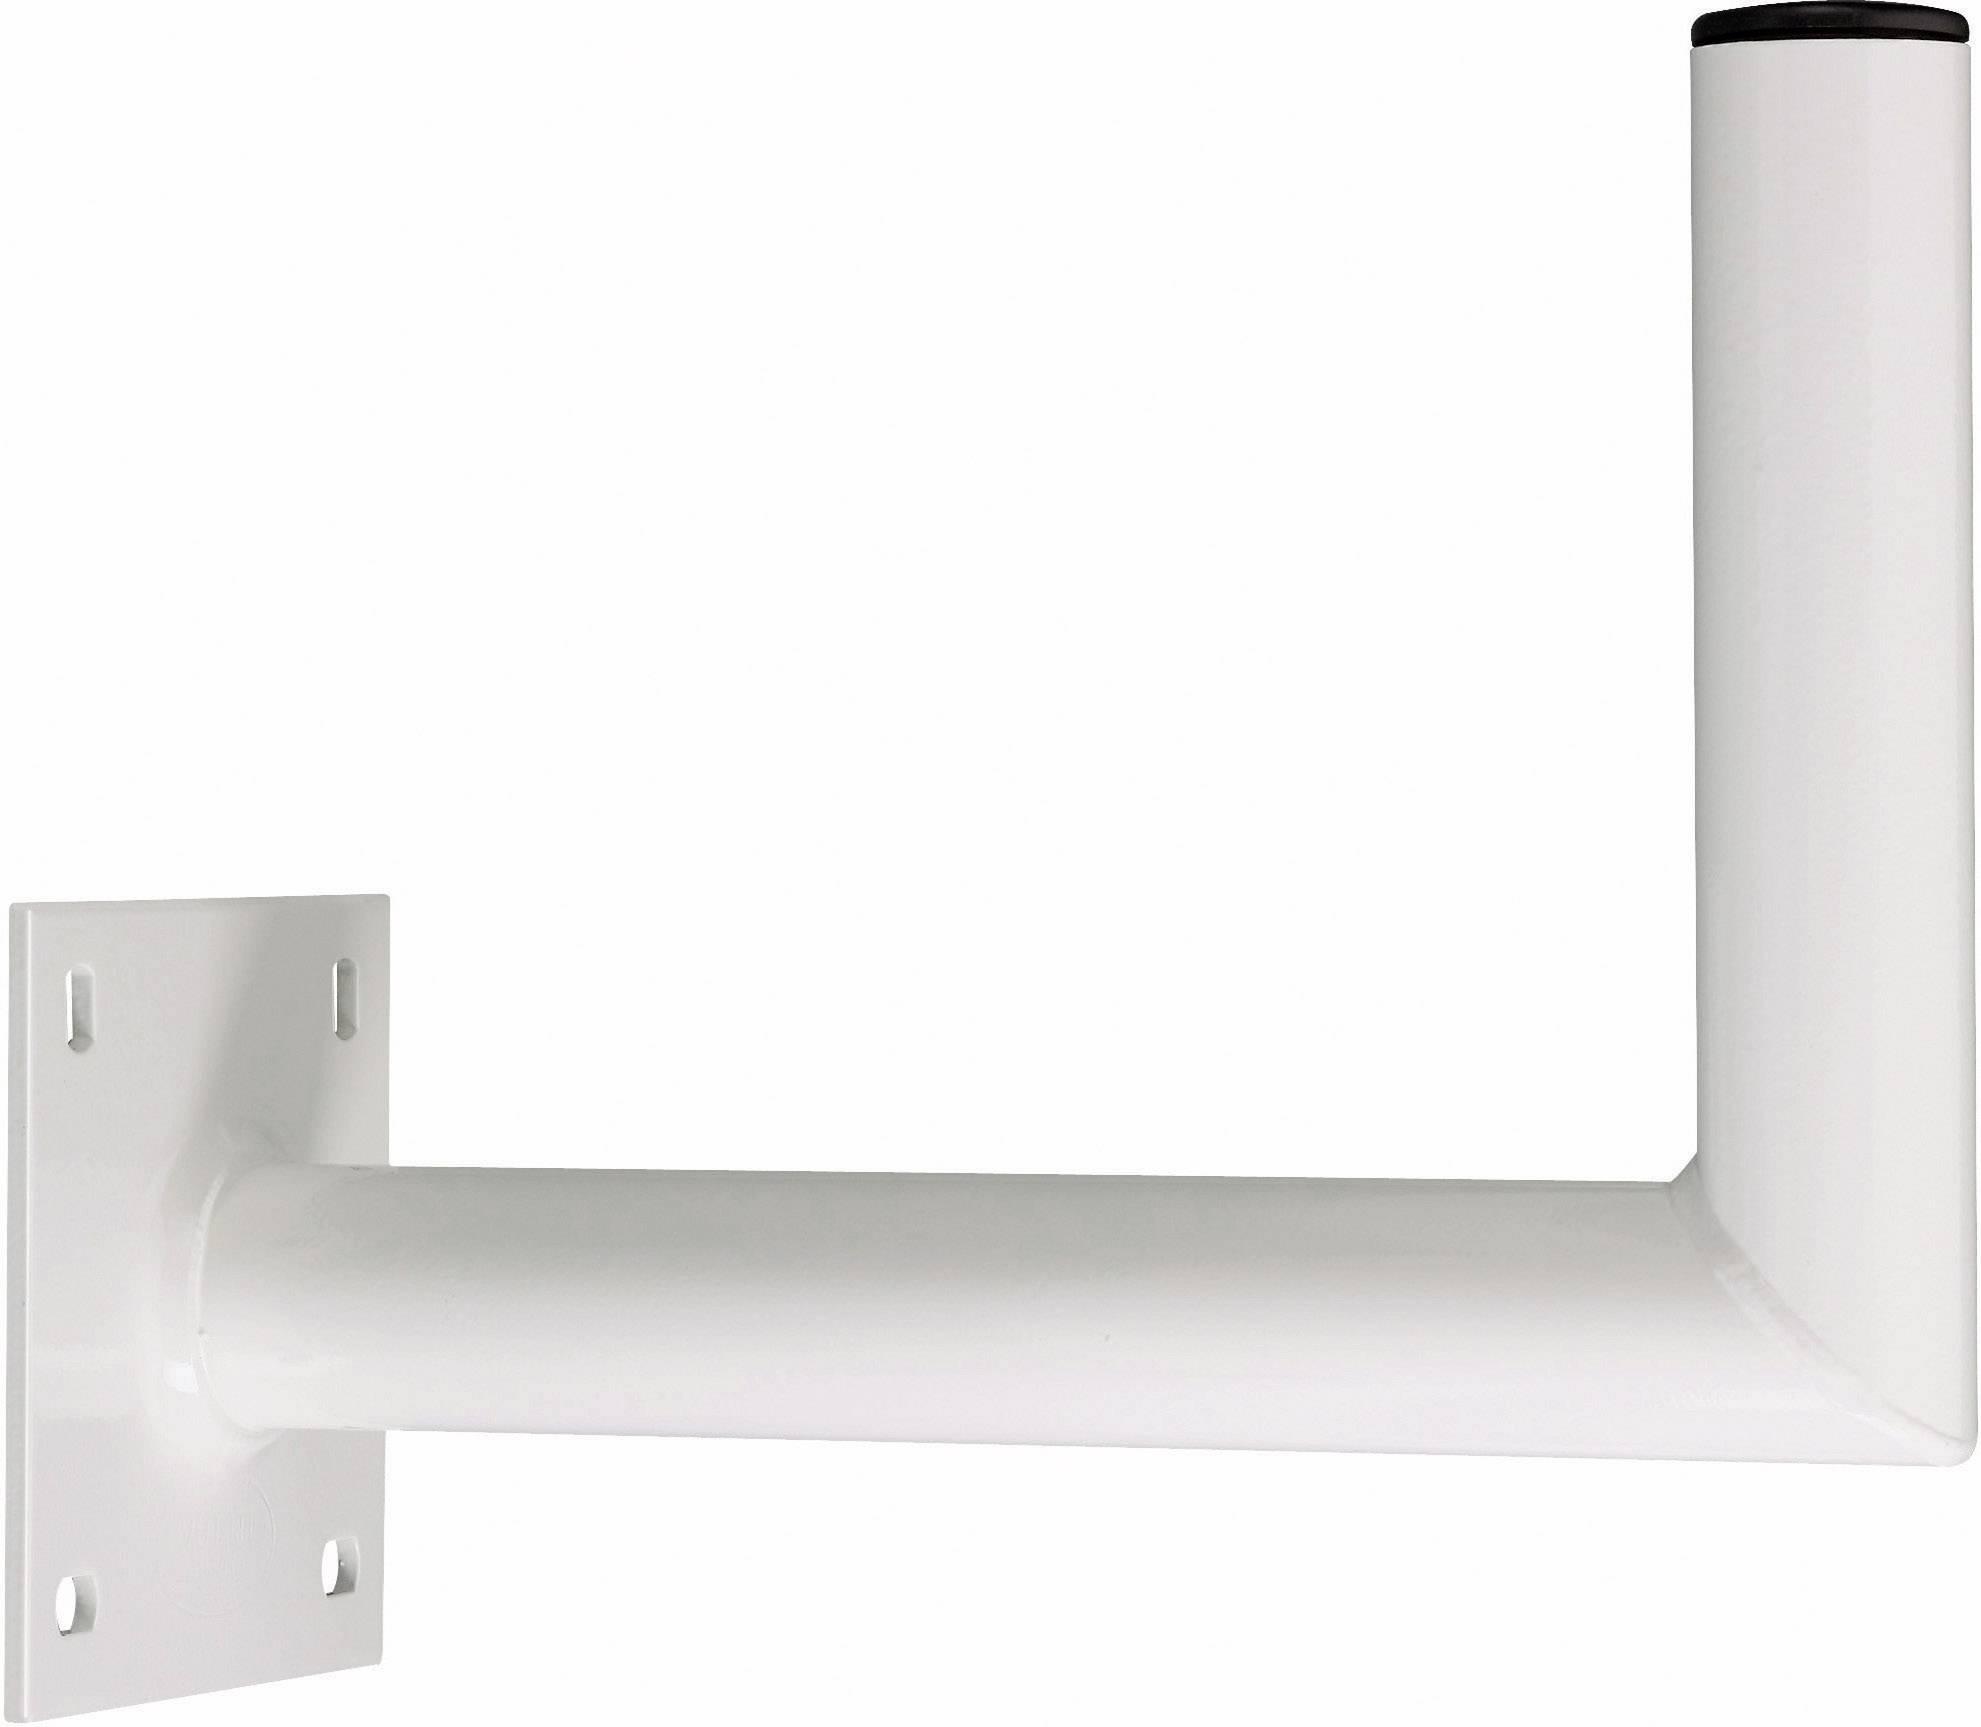 Držák na zeď A.S. SAT 10725, 25 x 25 cm, bílá